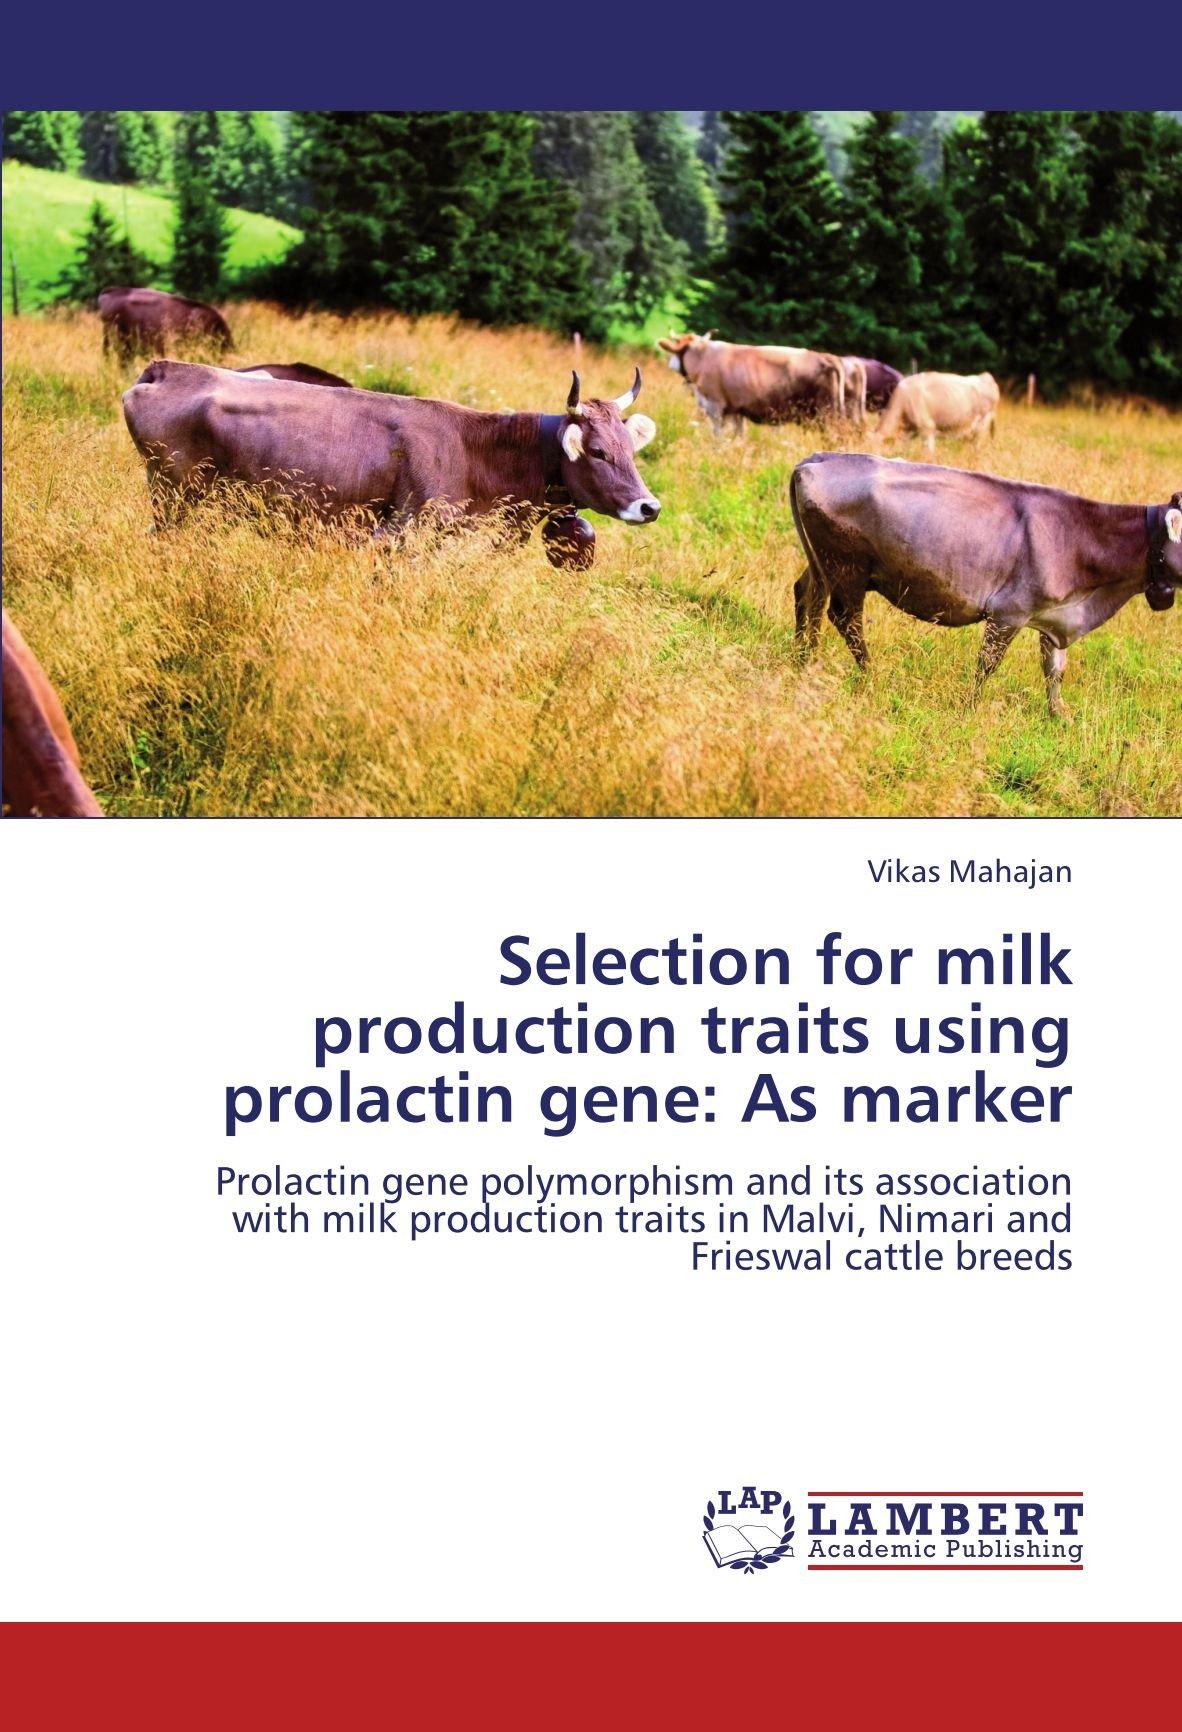 Selection for milk production traits using prolactin gene: As marker: Prolactin gene polymorphism and its association with milk production traits in Malvi, Nimari and Frieswal cattle breeds pdf